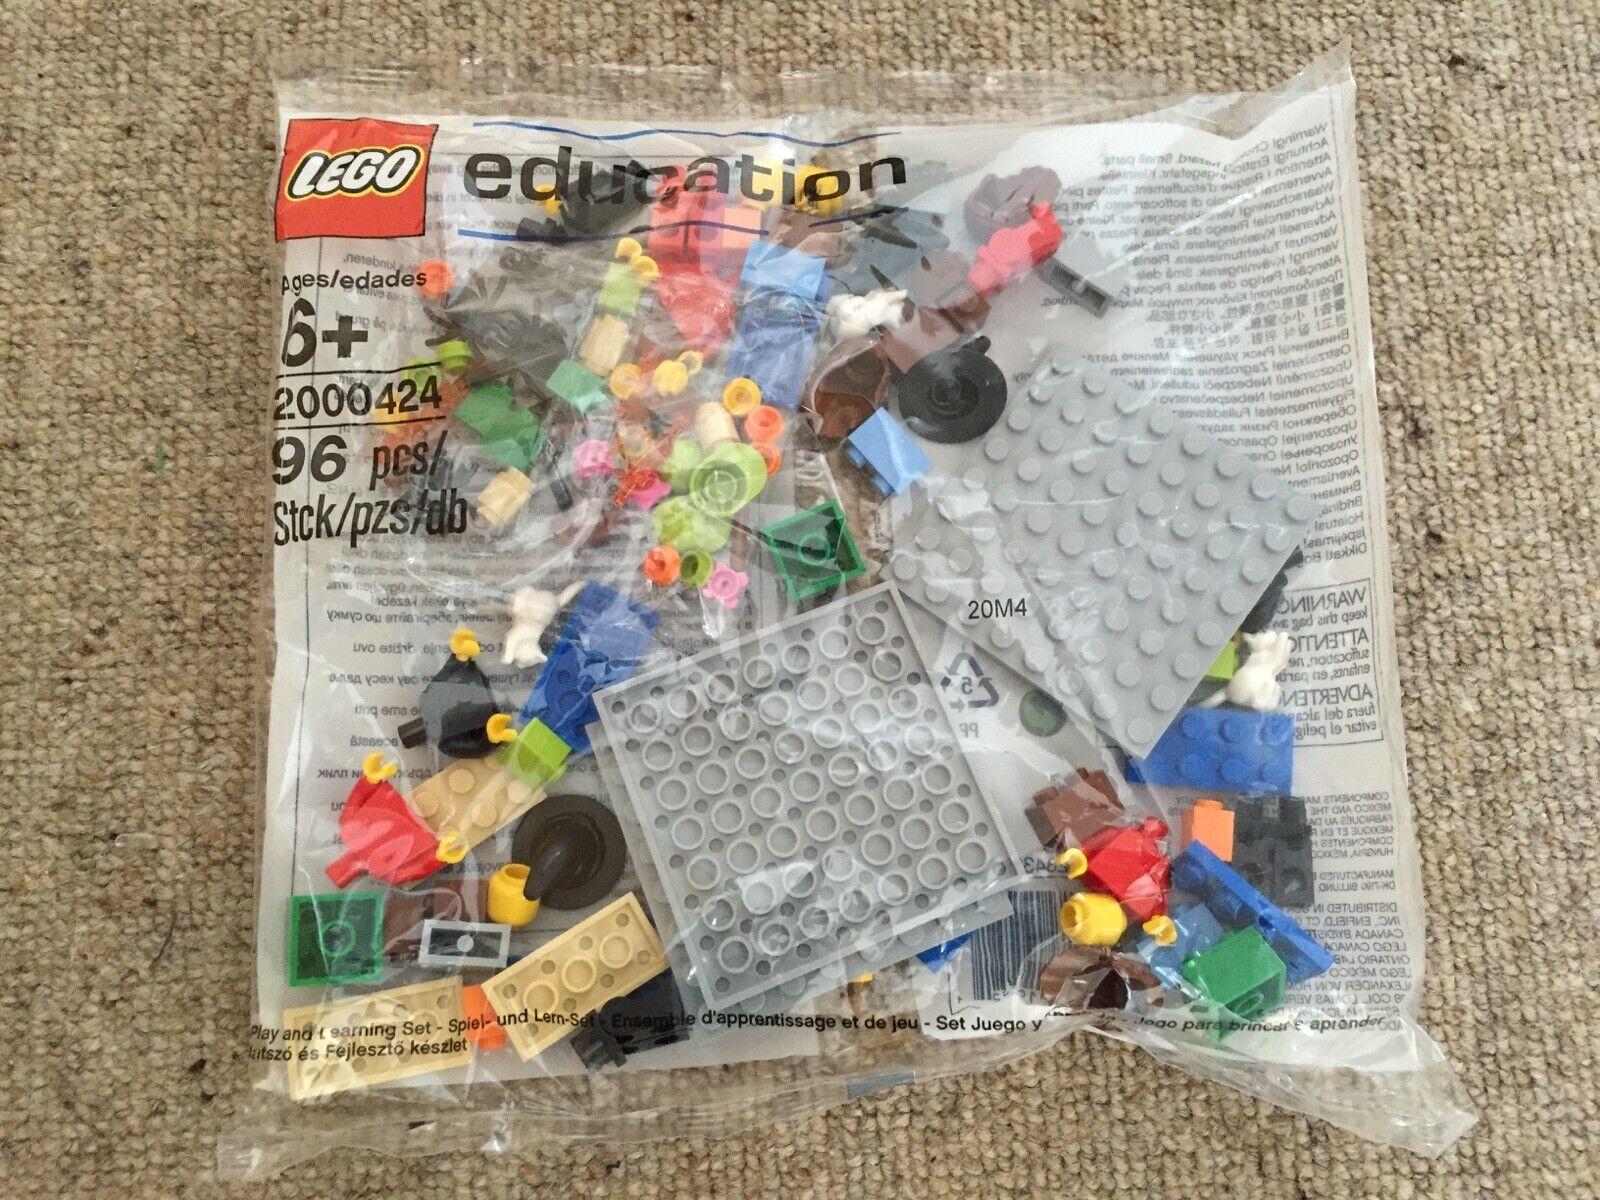 LEGO 2000424 EDUCATION - STORY STARTER SAMPLE SET - SEALED POLYBAG - RARE